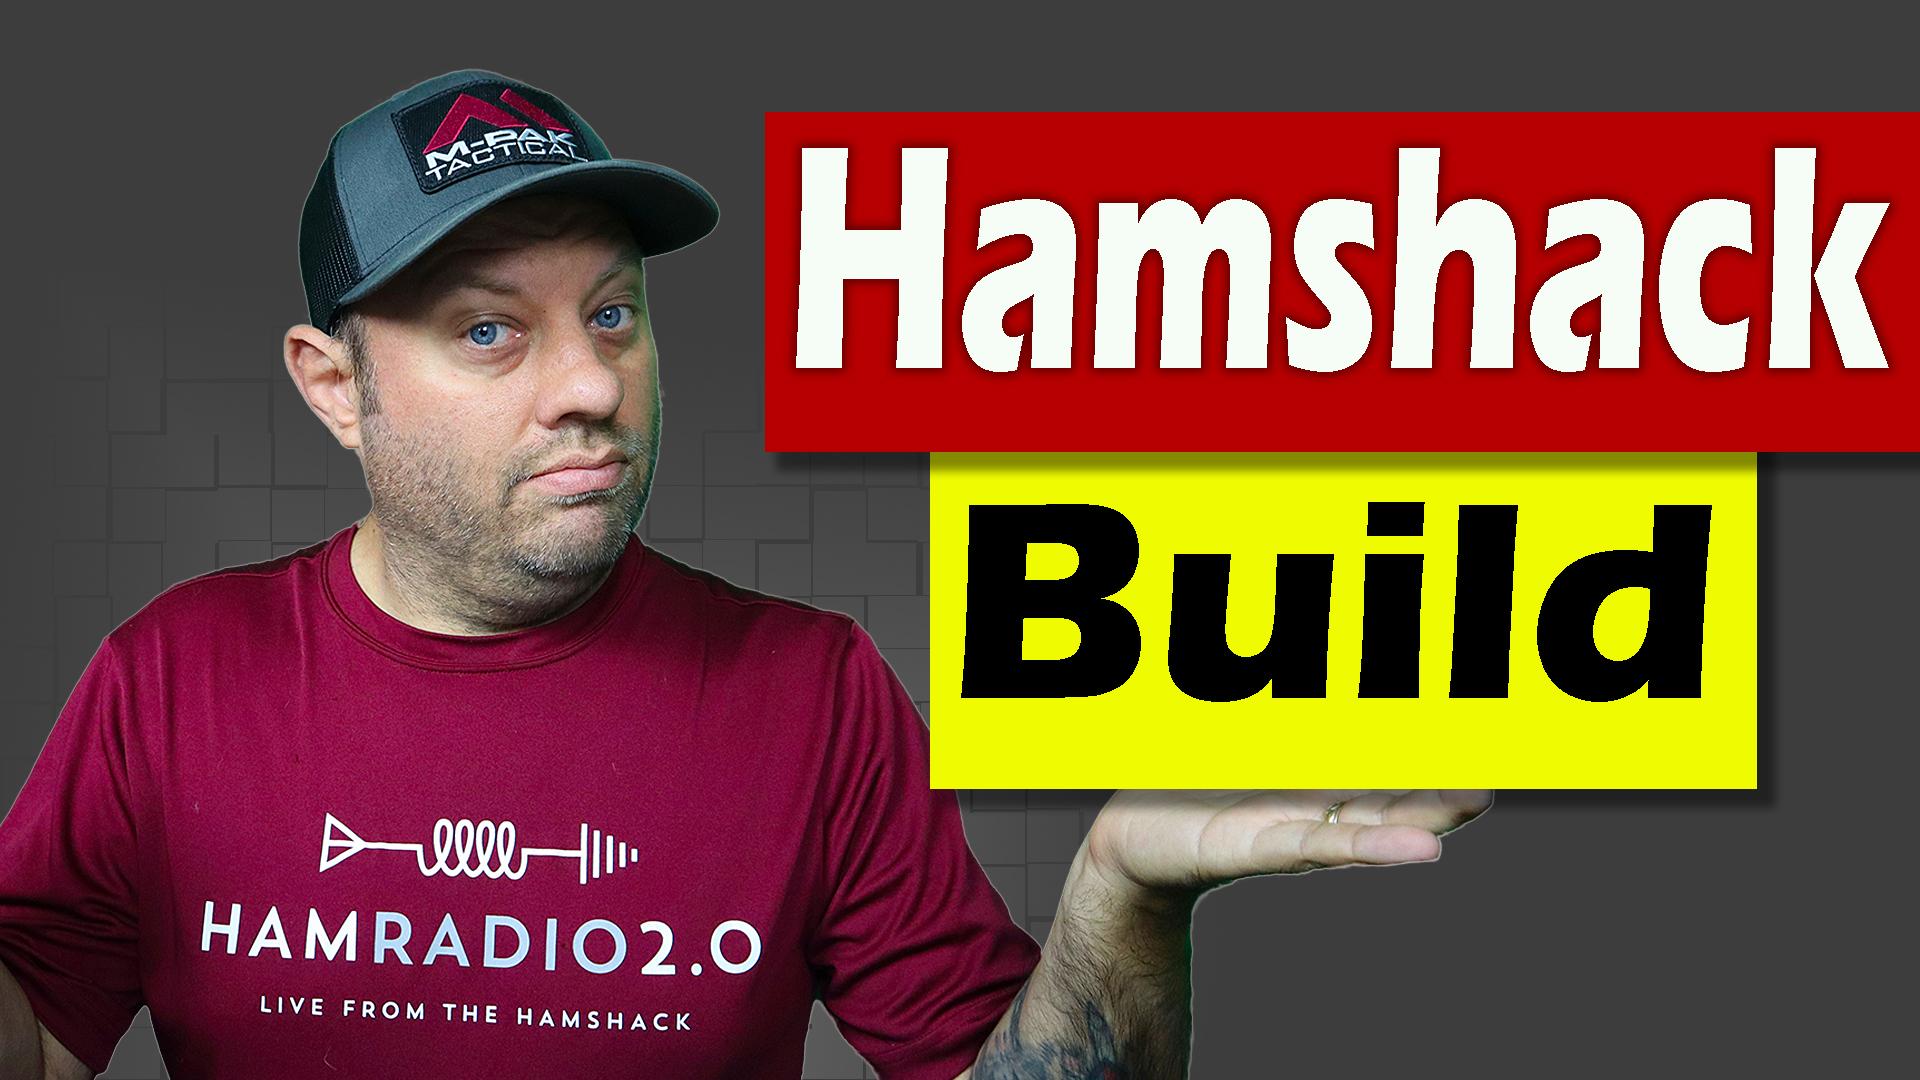 Episode 466: Ham Shack Setup and Tour